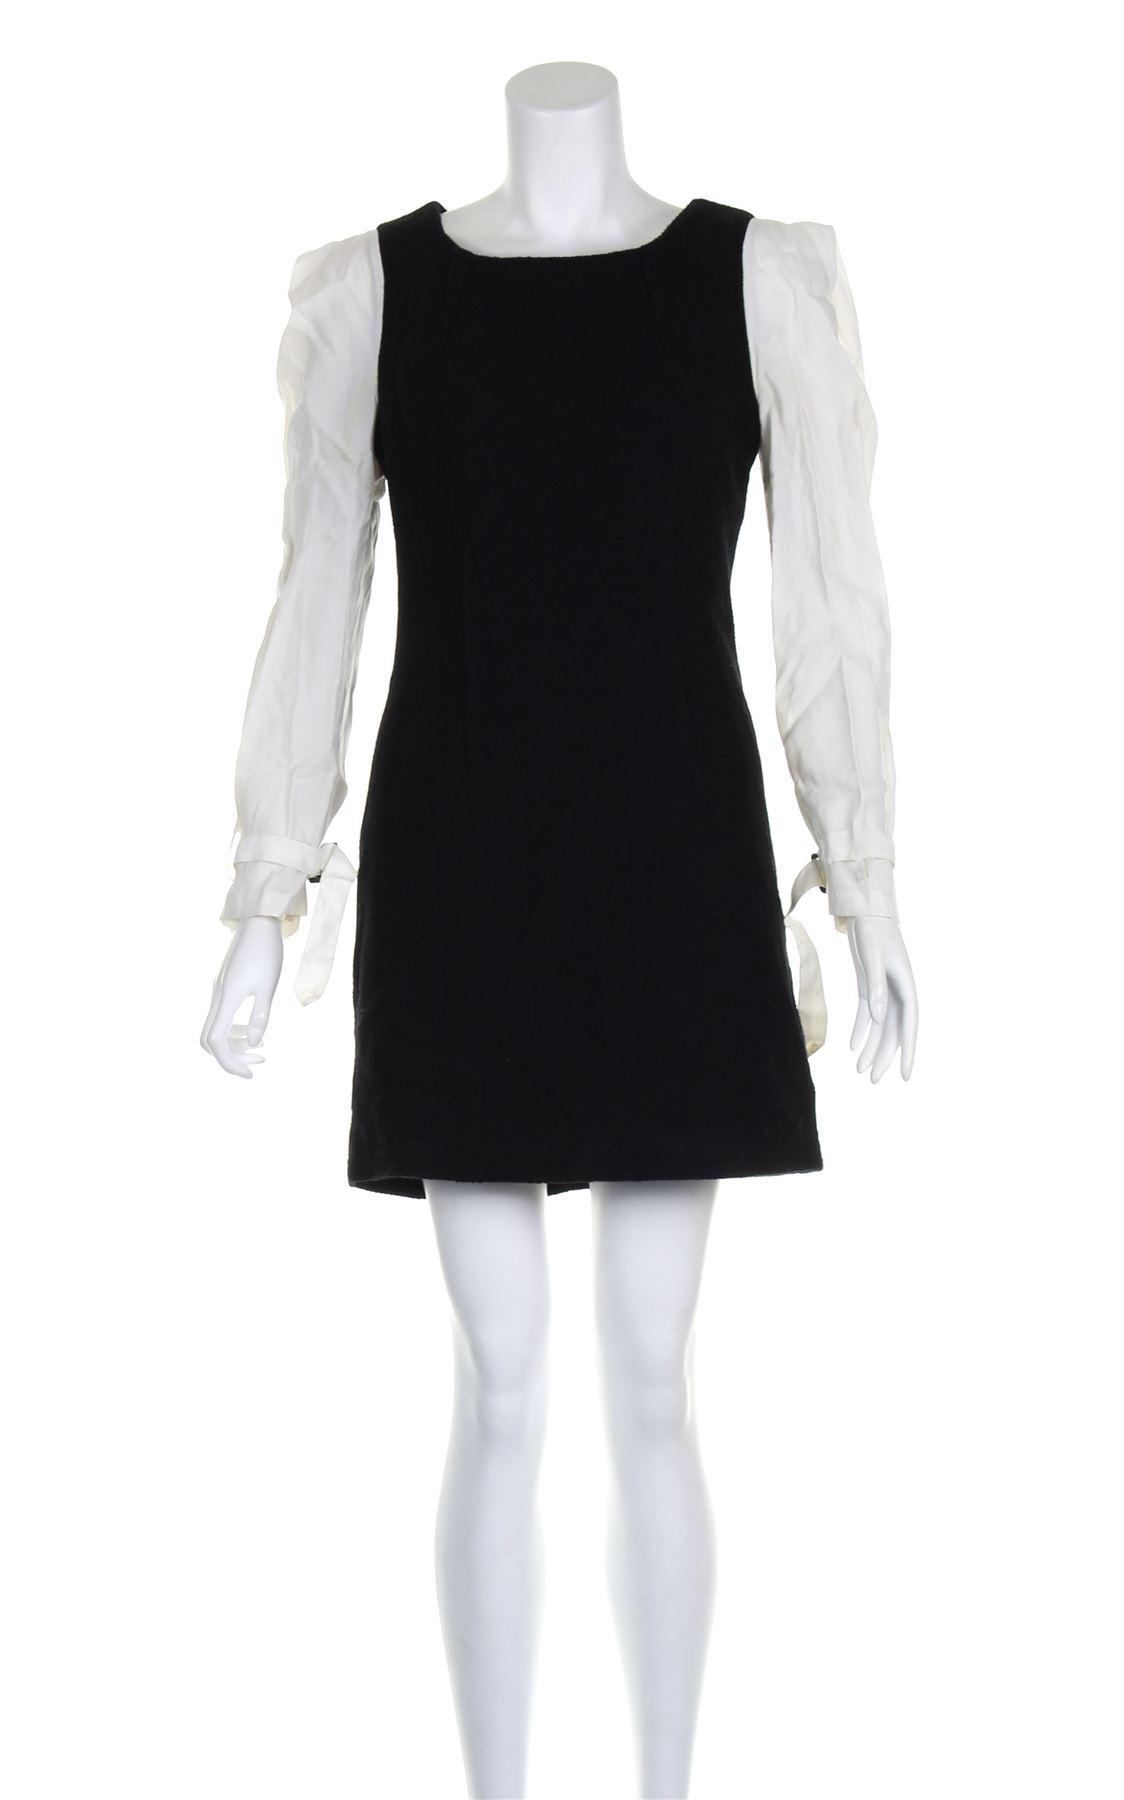 708137c0c BALENCIAGA Negro de lana blanca mini vestido